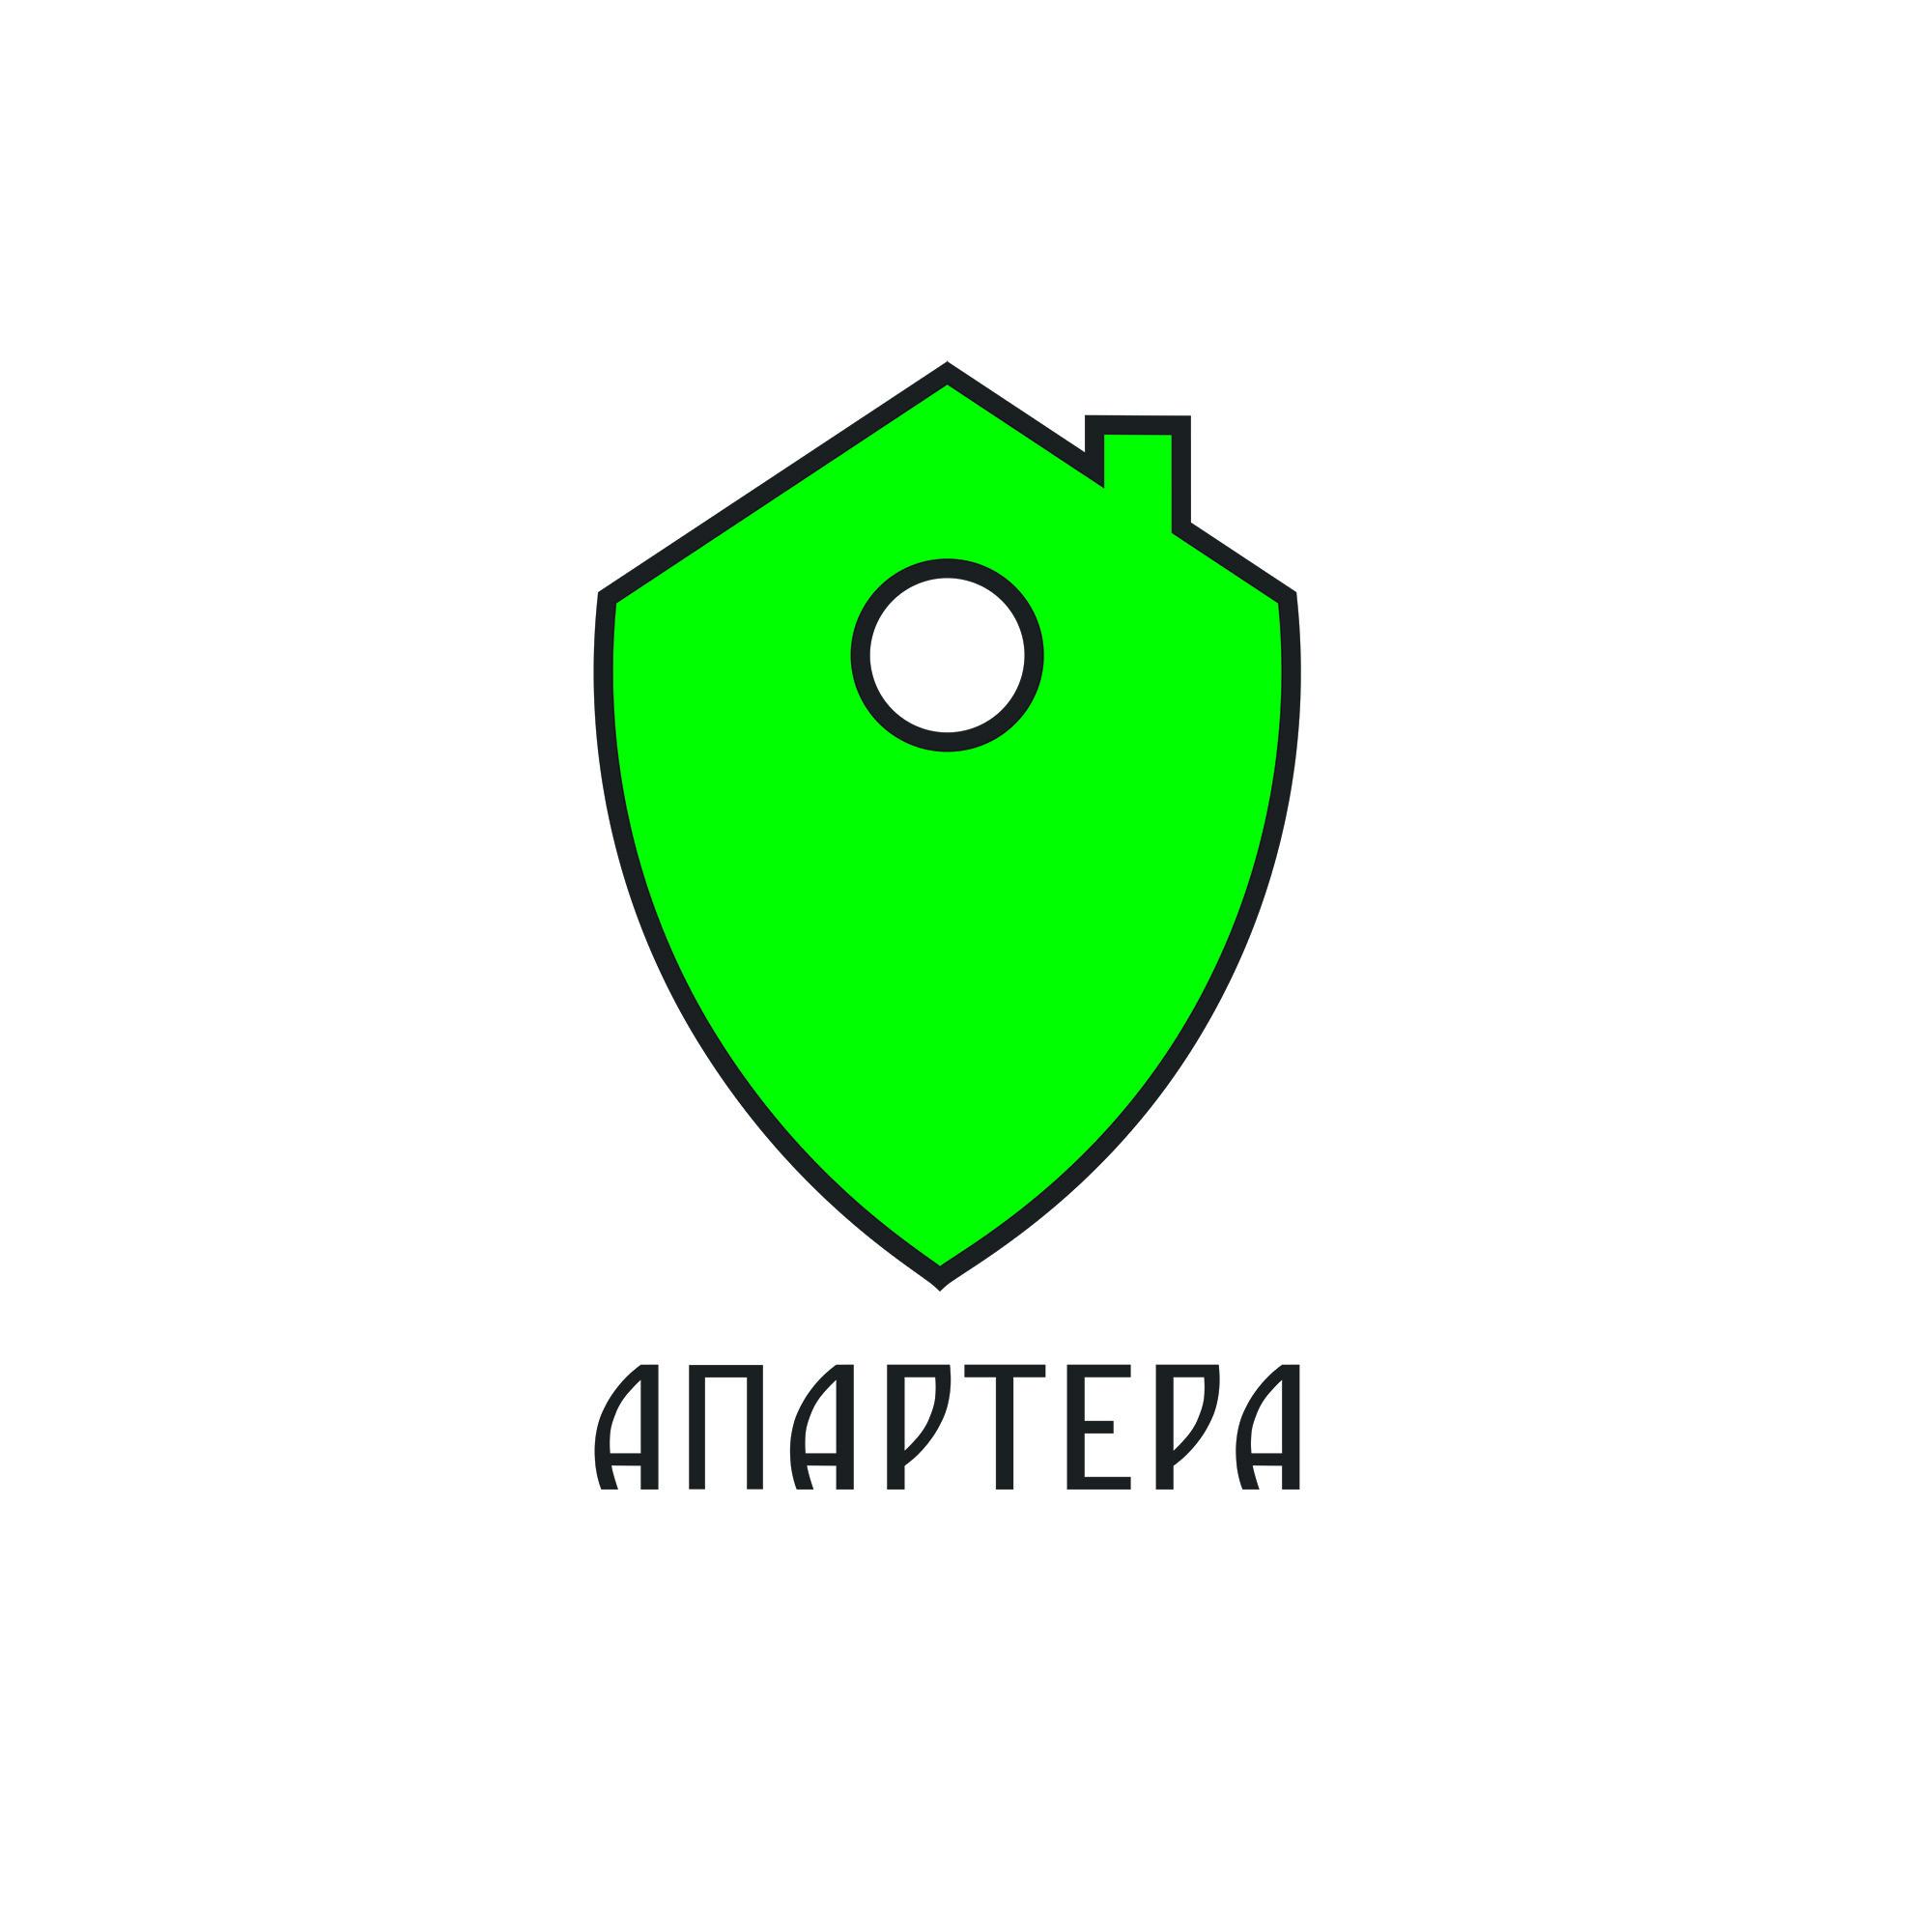 Логотип для управляющей компании  фото f_7075b7937a3d5089.jpg